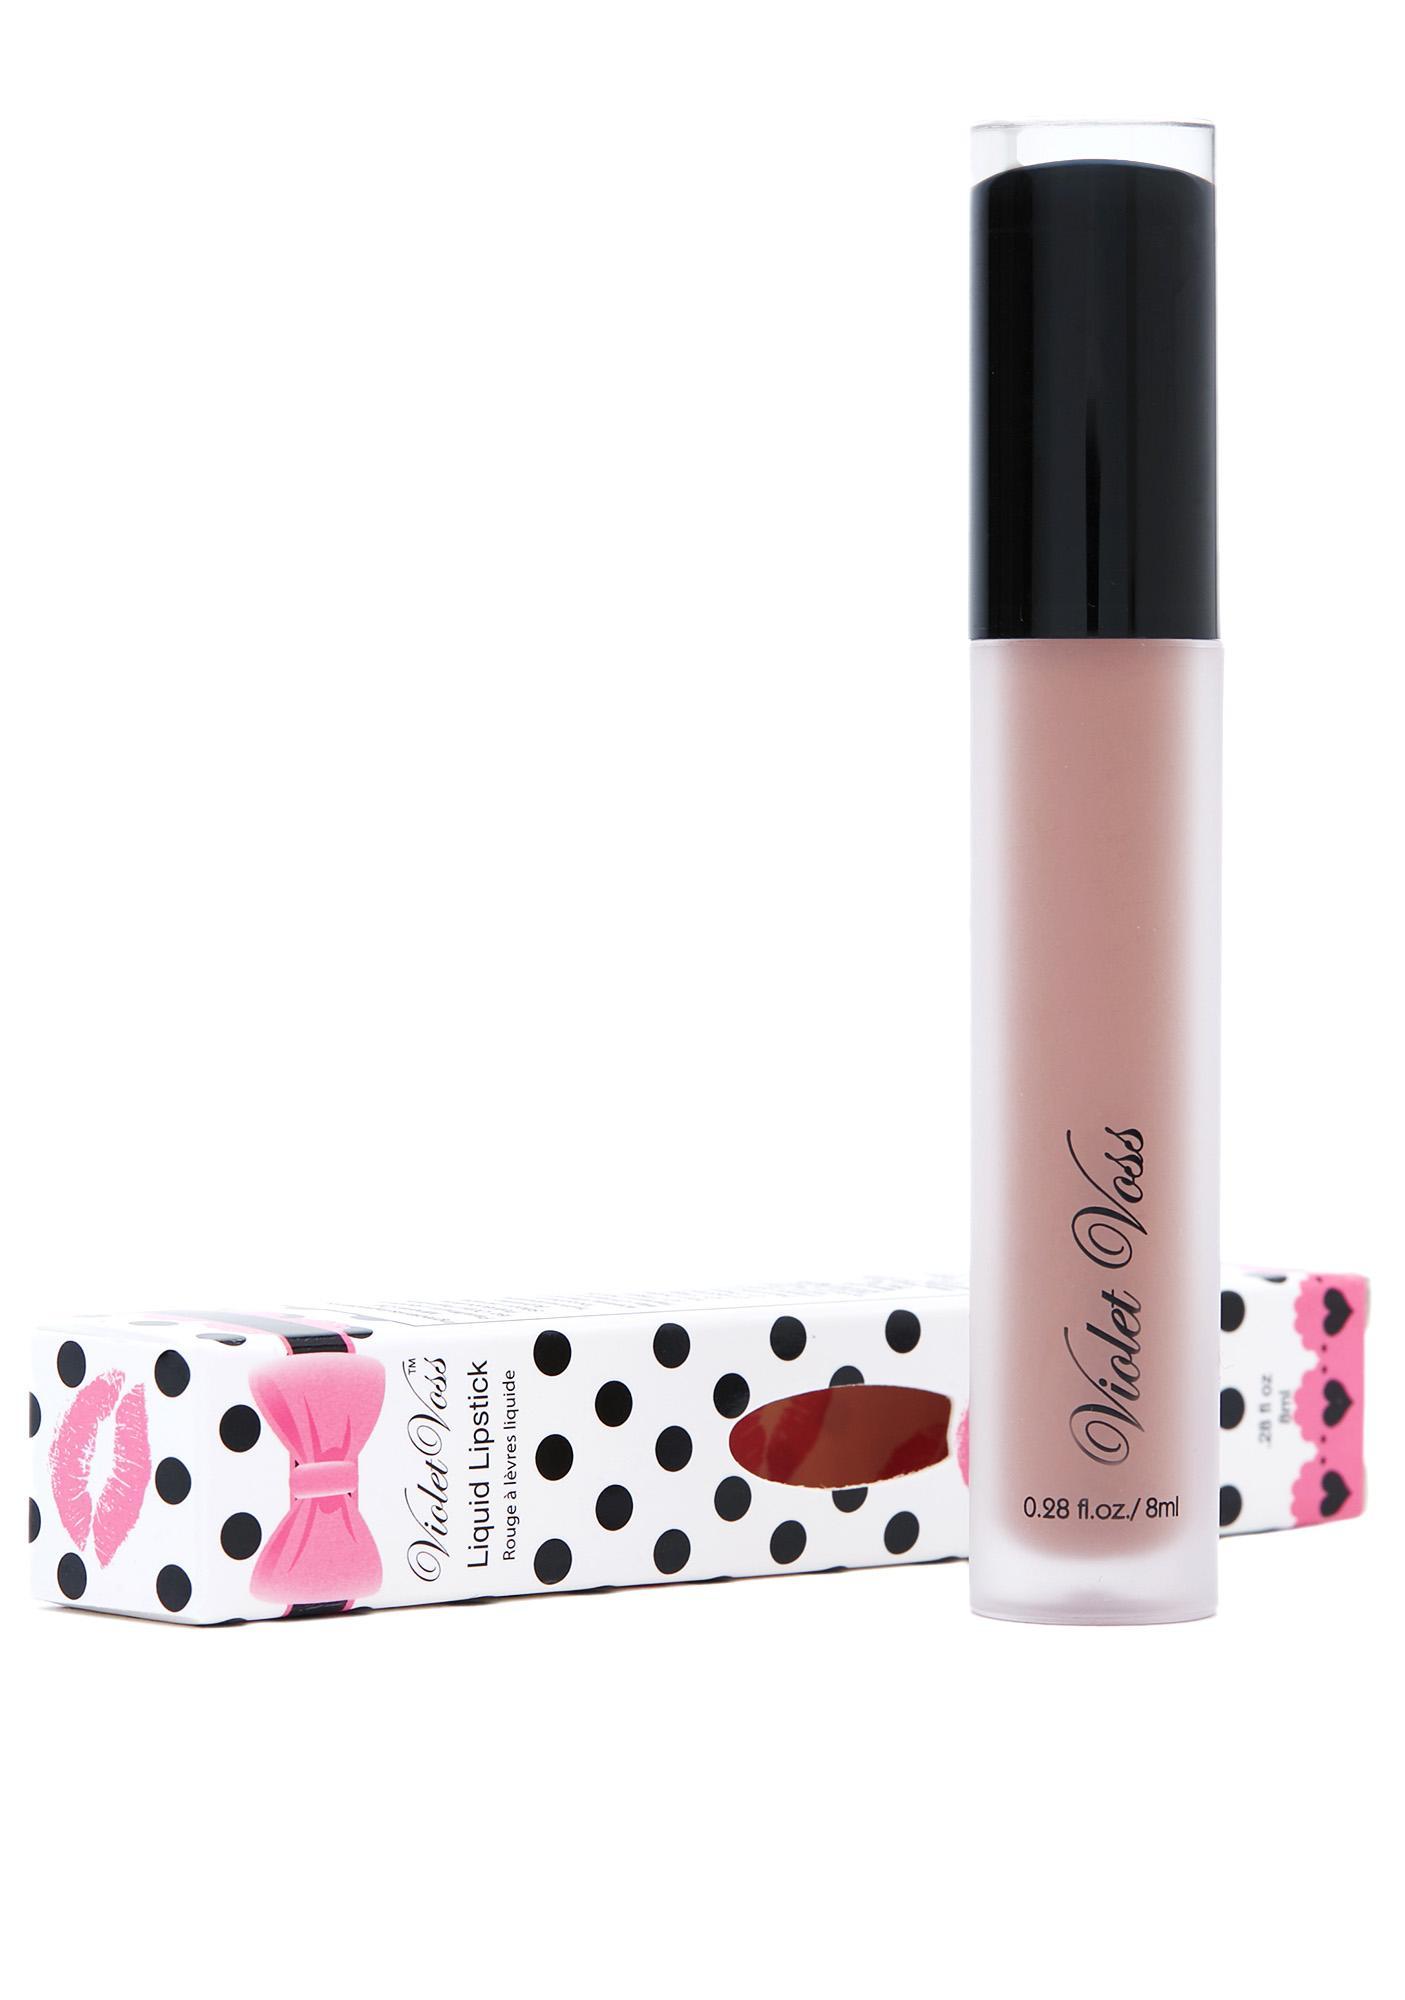 Violet Voss Lust Matte Liquid Lipstick